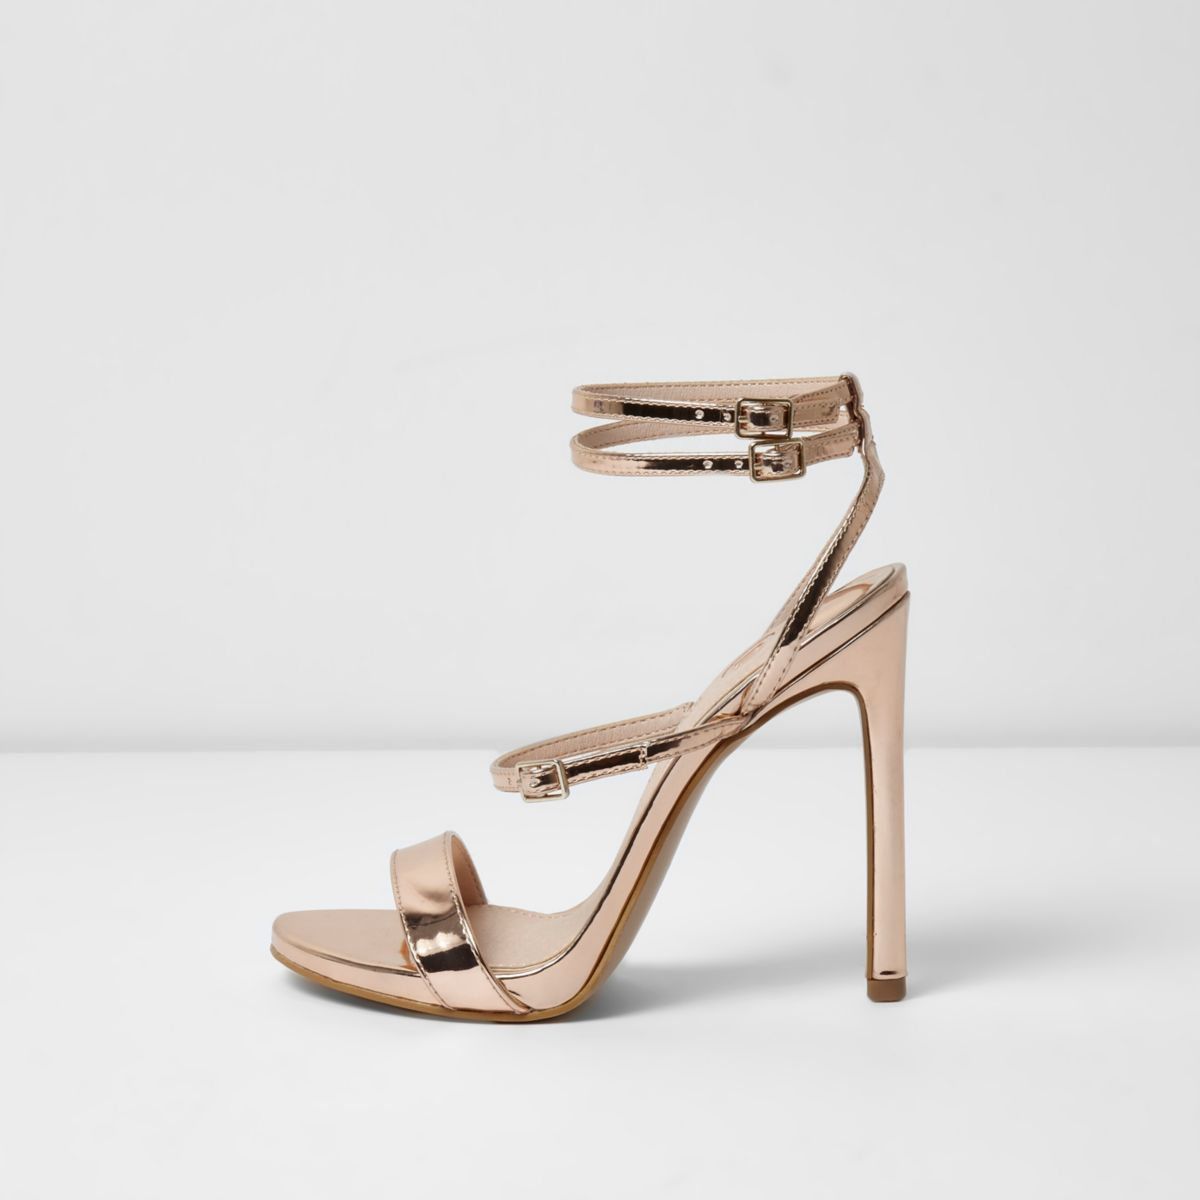 Gold metallic strappy sandals